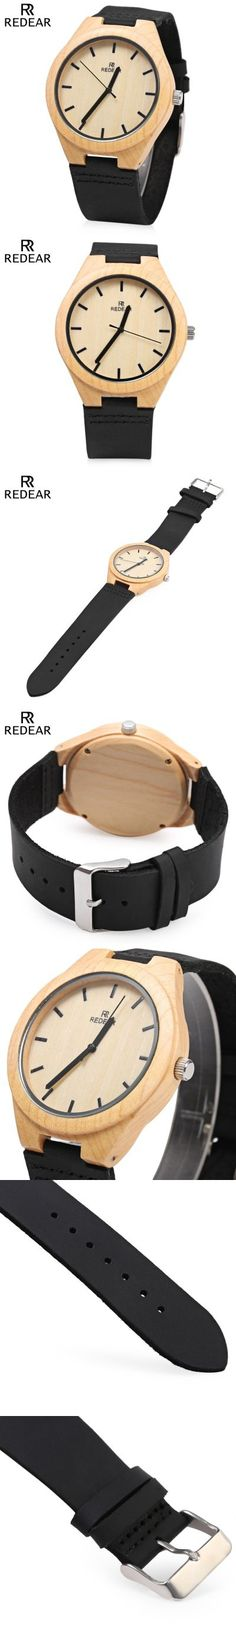 Mens Watches | REDEAR Wooden Quartz Male Watch